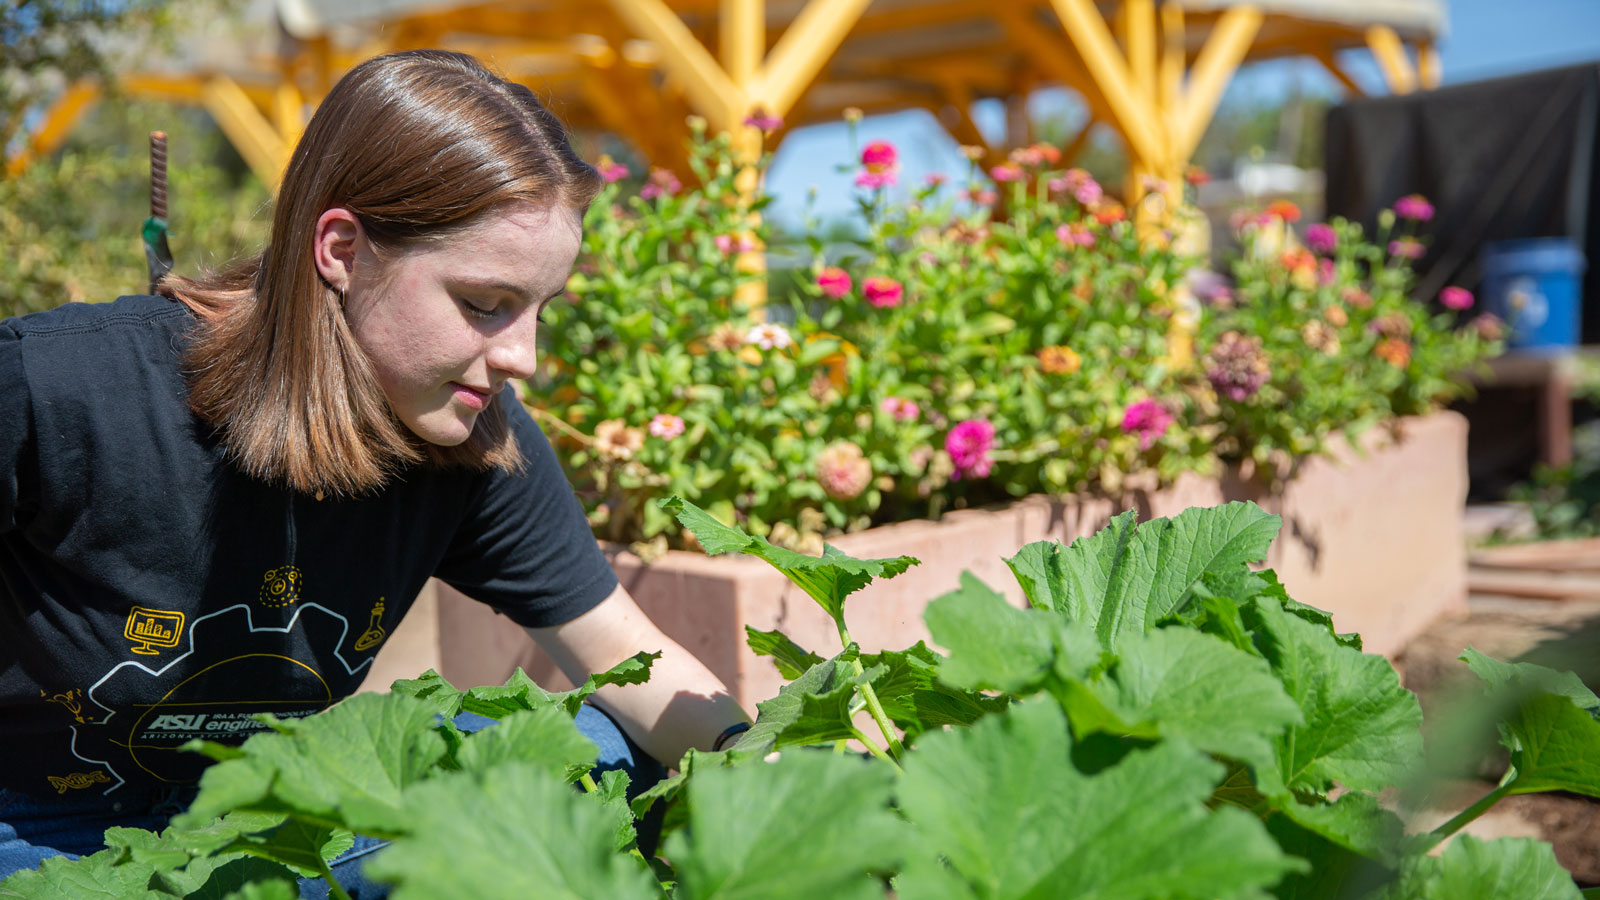 Emma Bonham works in the Keep Phoenix Beautiful Community Garden